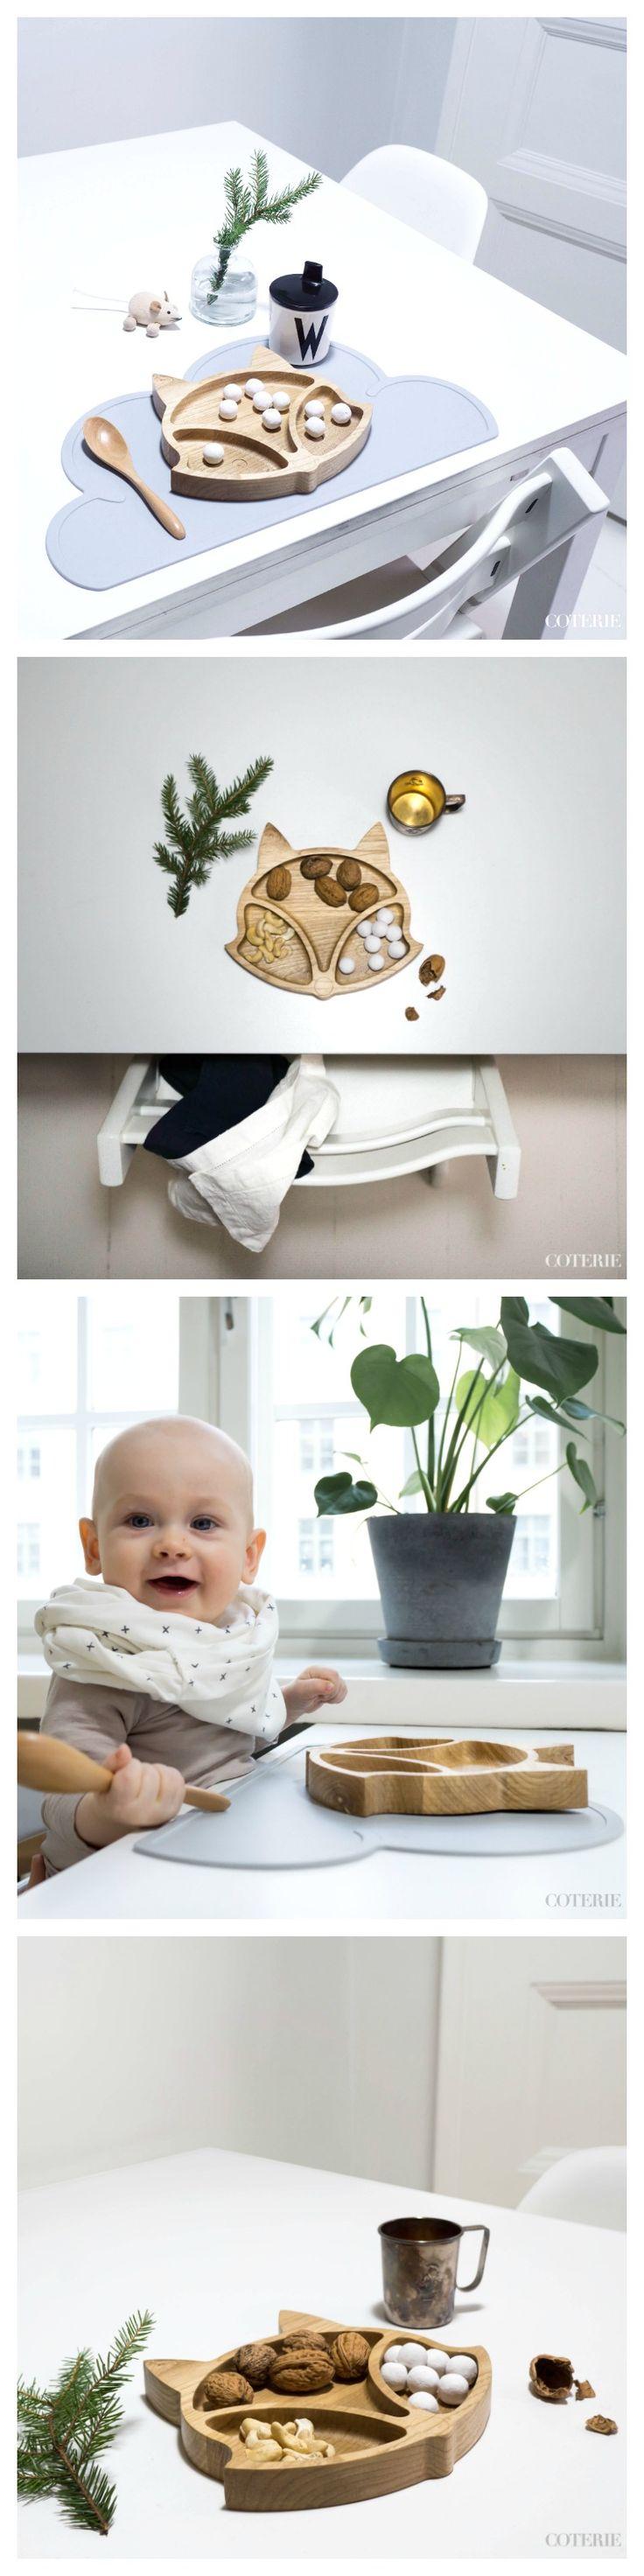 74 best Baby design images on Pinterest